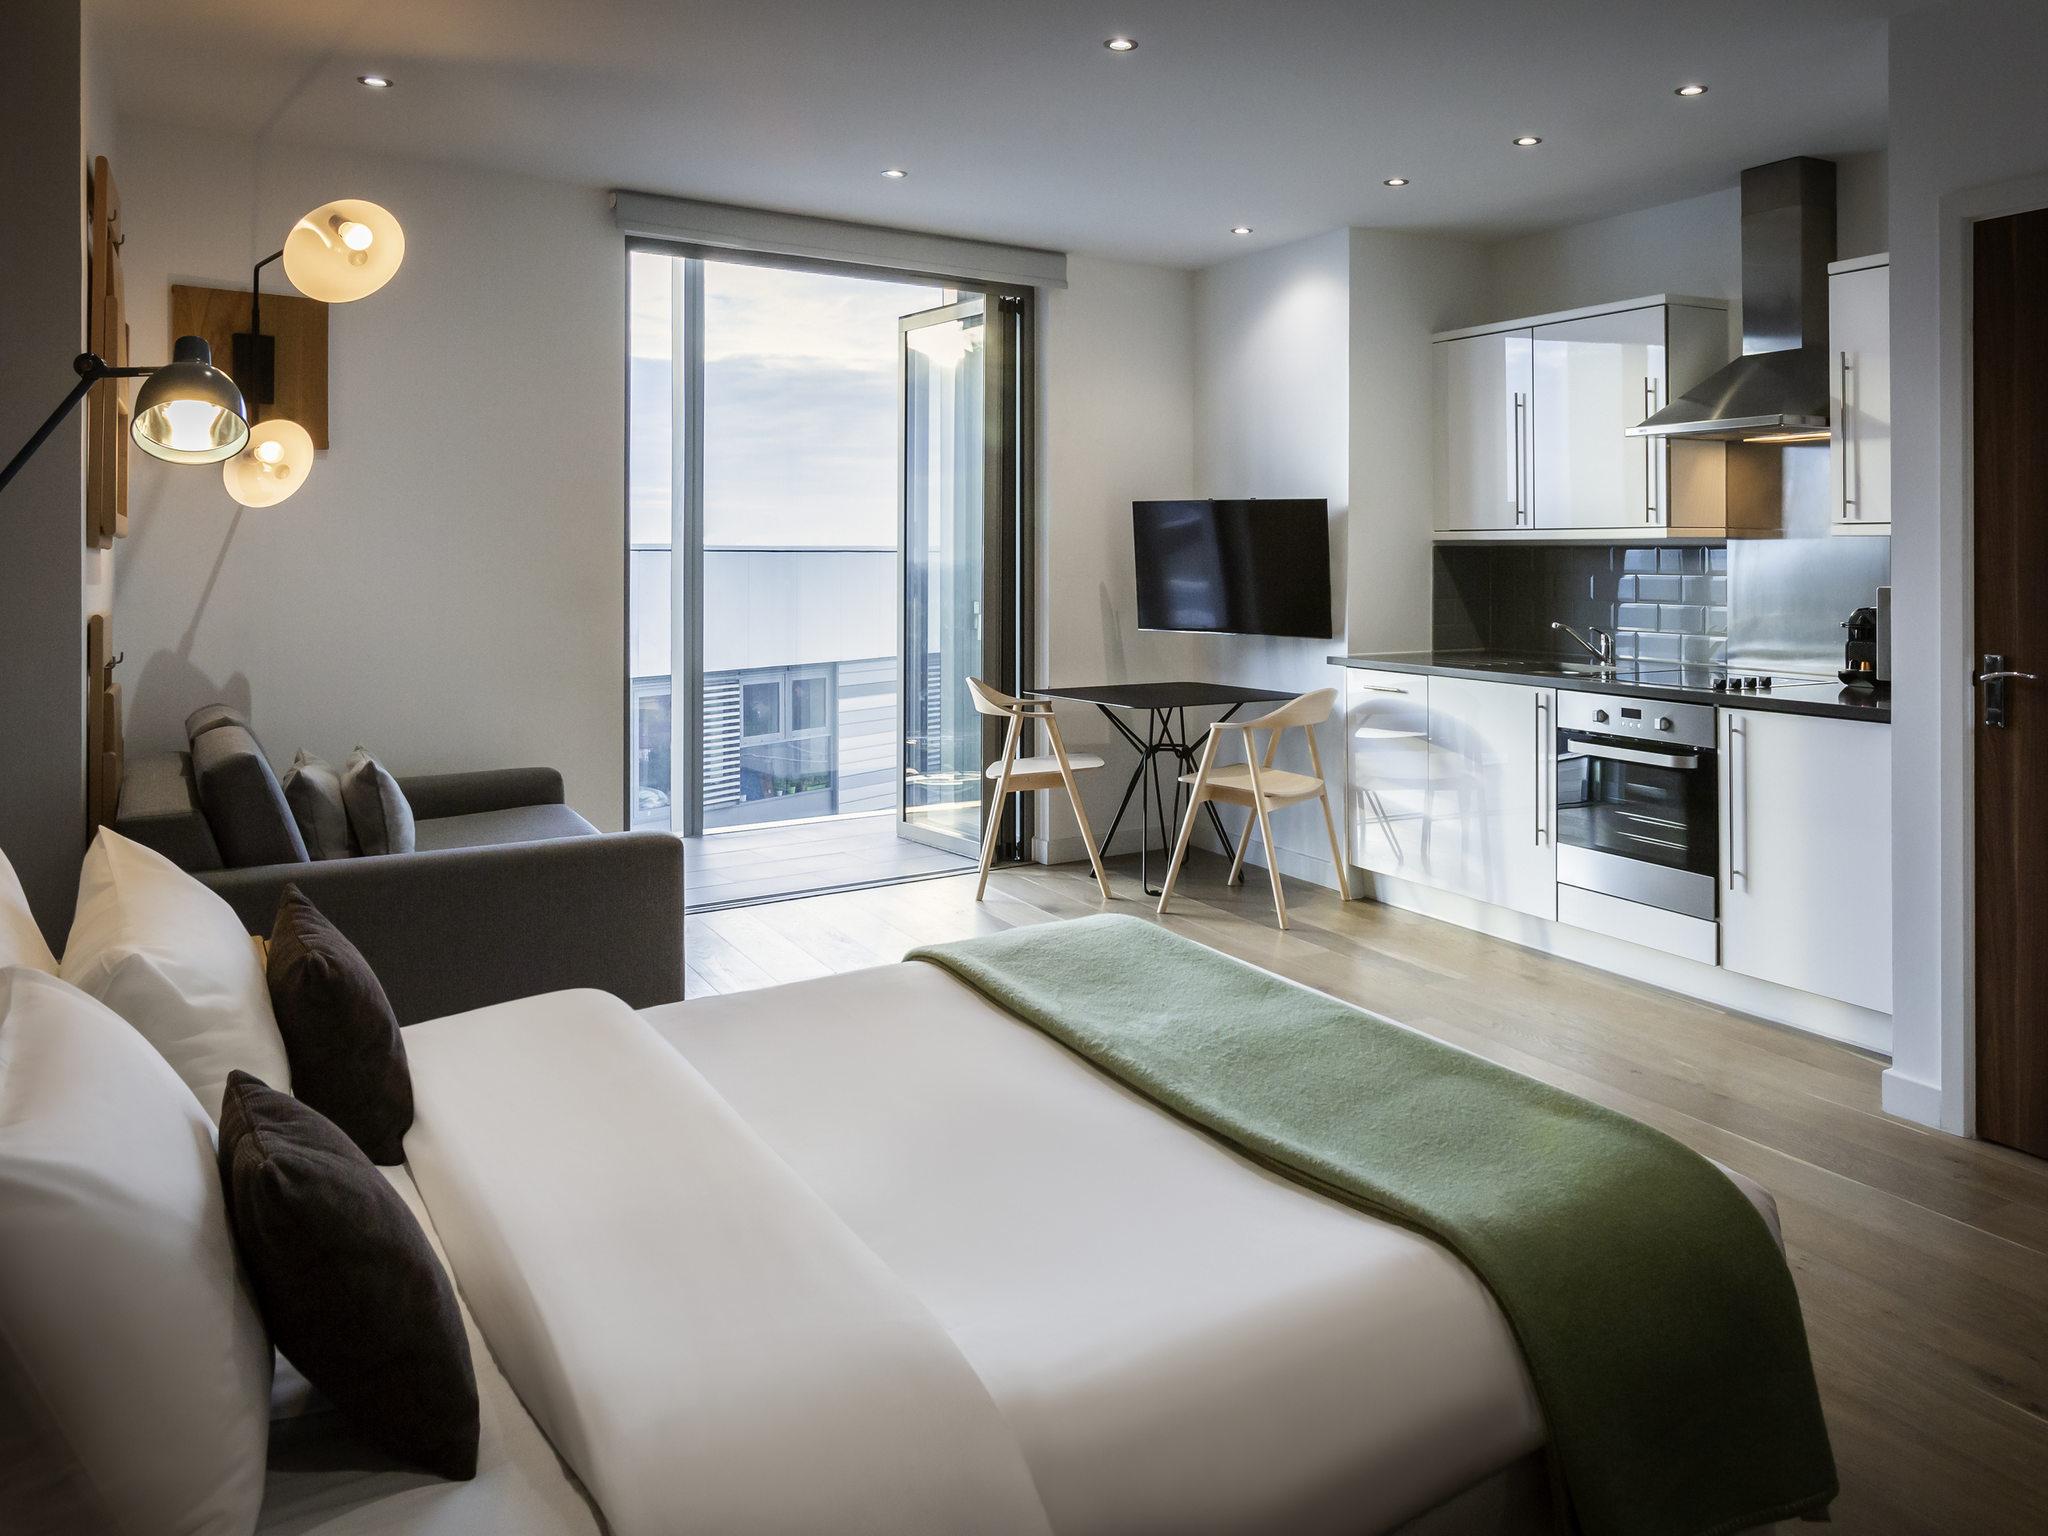 Hotel – Aparthotel Adagio London Brentford (apertura: ottobre 2018)